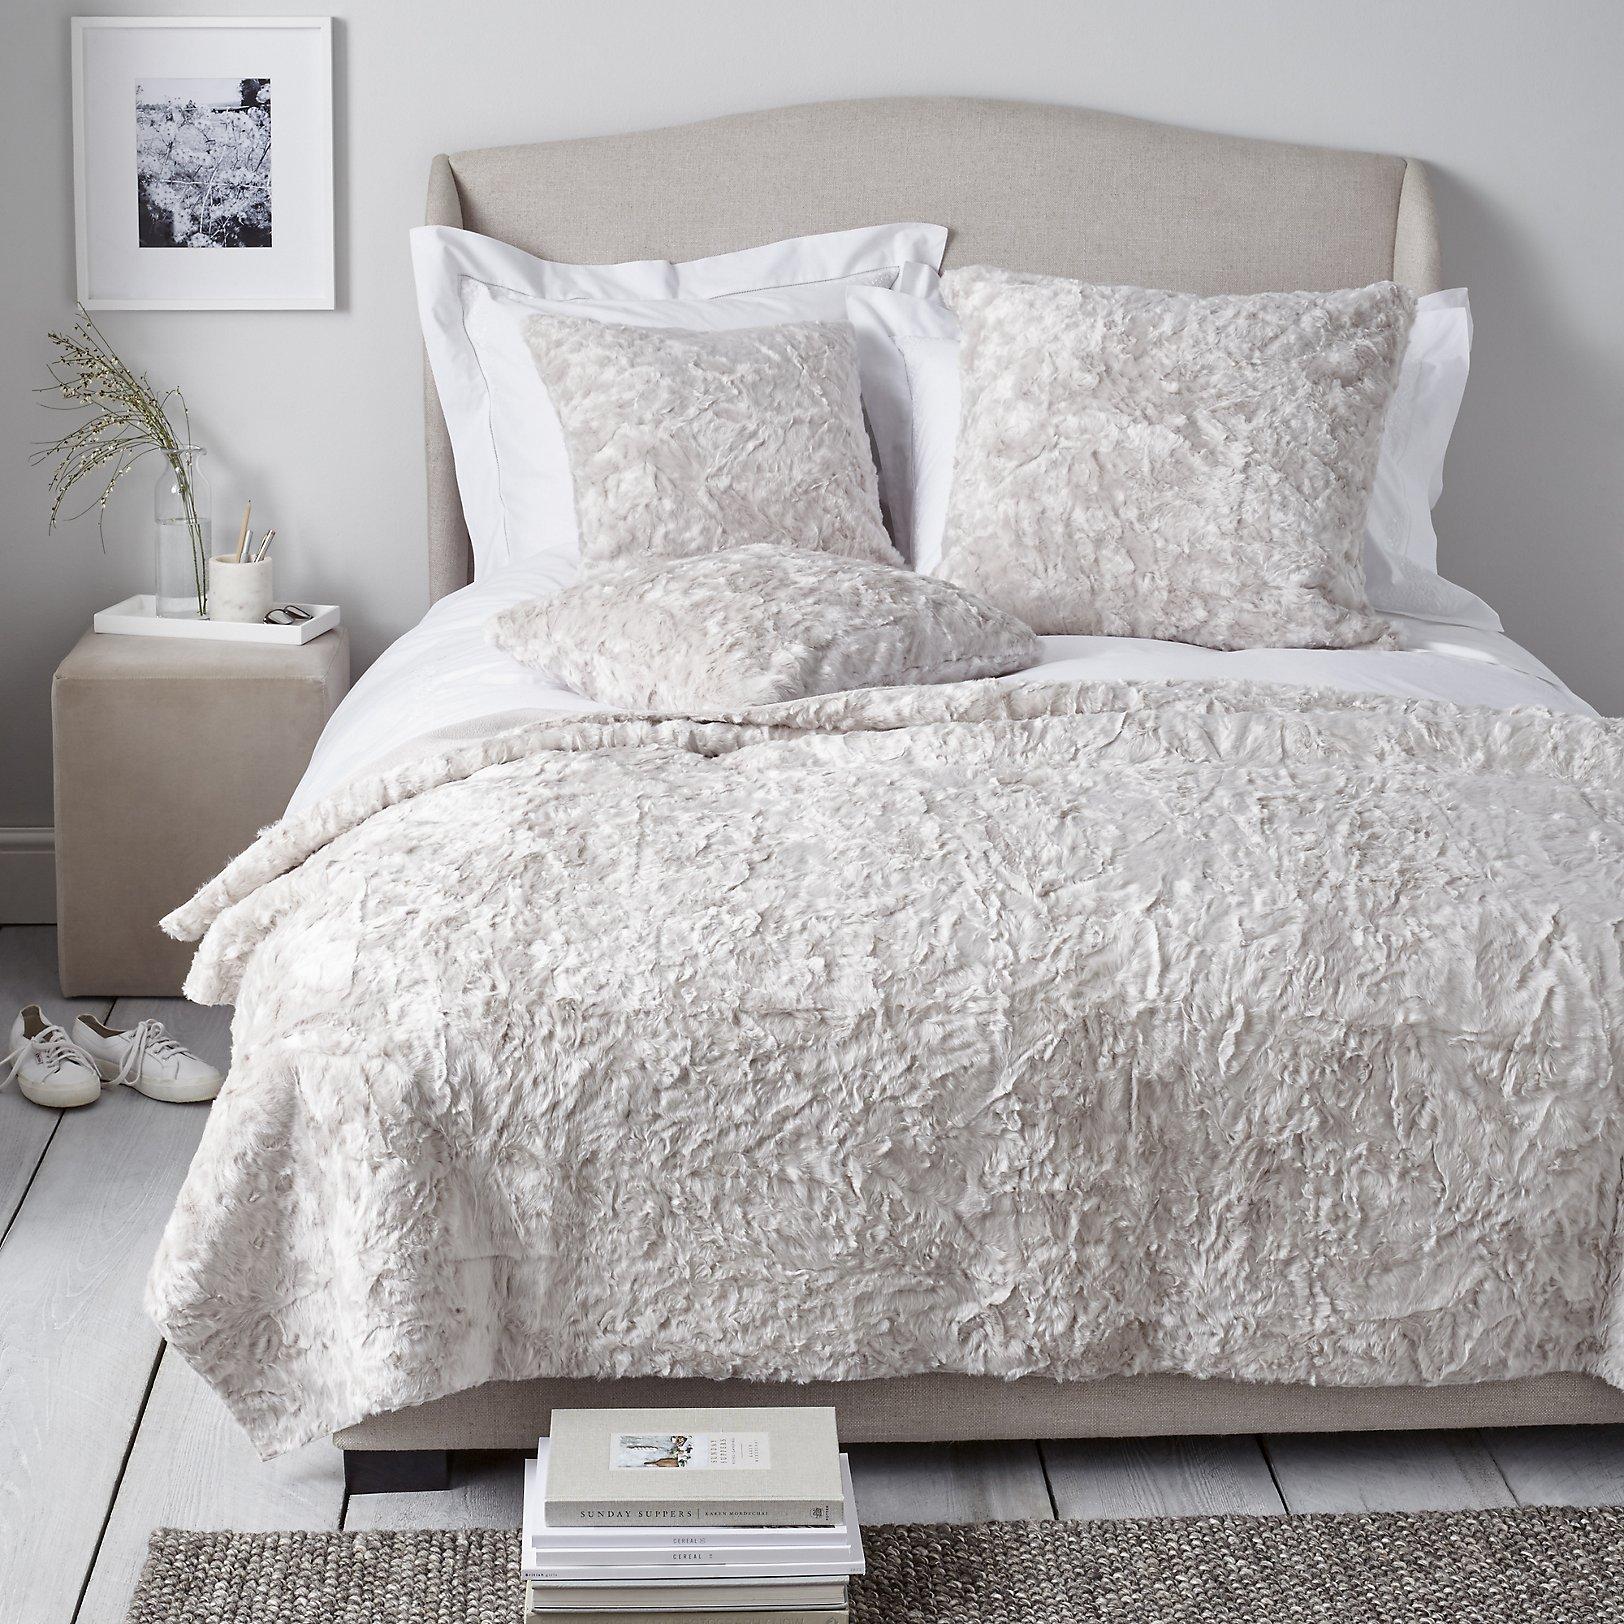 bedroom throws and cushions Farmersagentartruiz.com